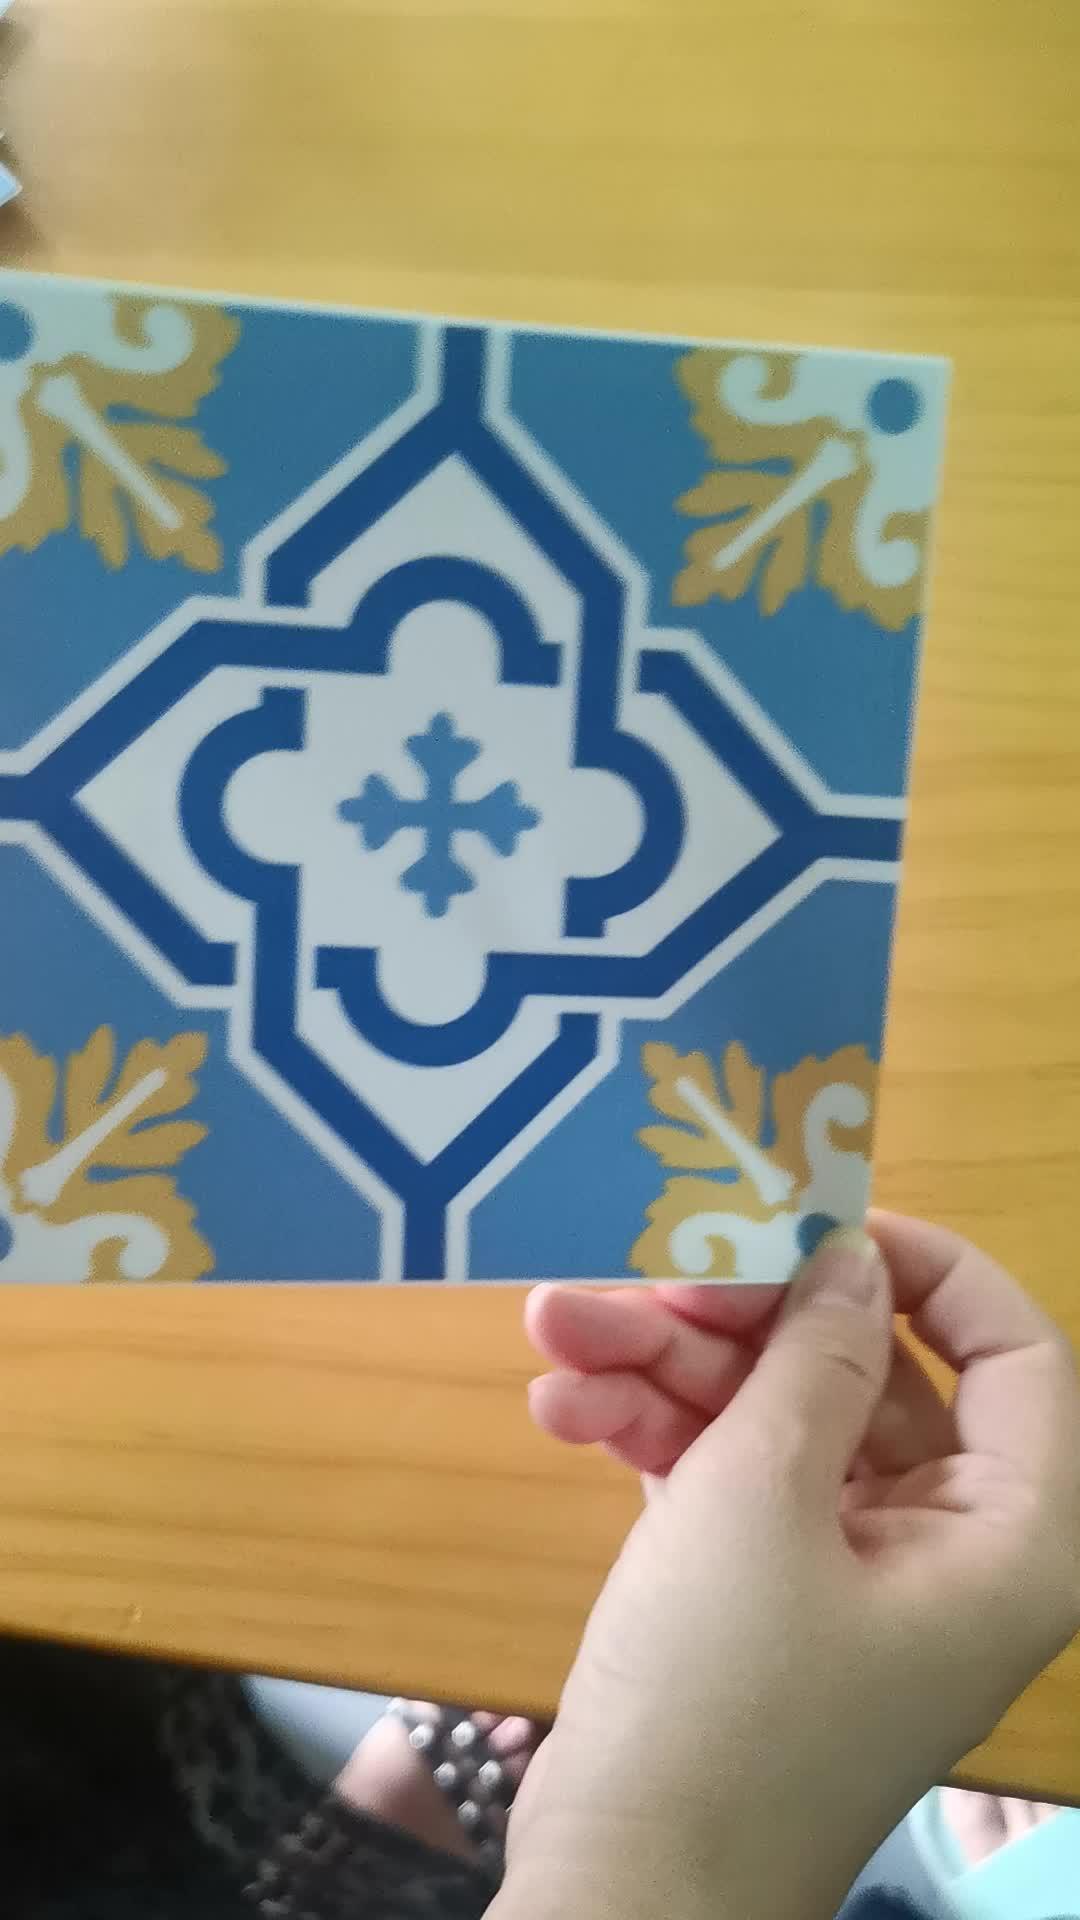 Cocina baño escalera vertical pegatinas-adhesivos contra azulejos calcomanía: Paquete de 24